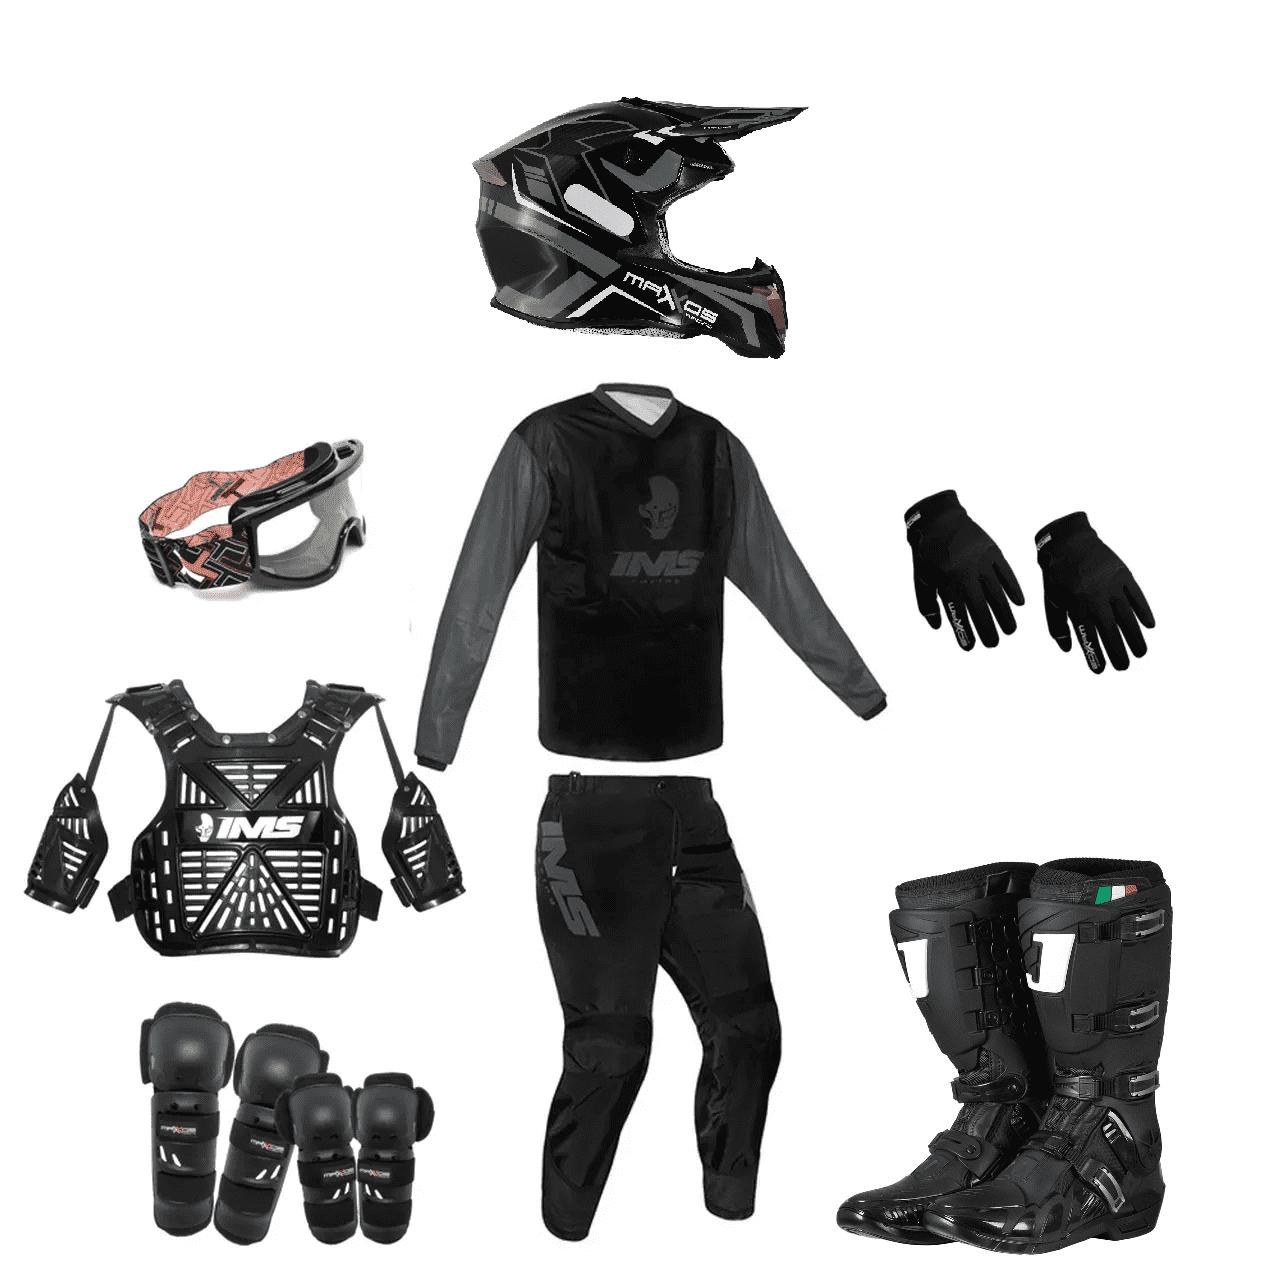 Kit Equipamento Trilha Motocross Enduro Basic 2 - Preto